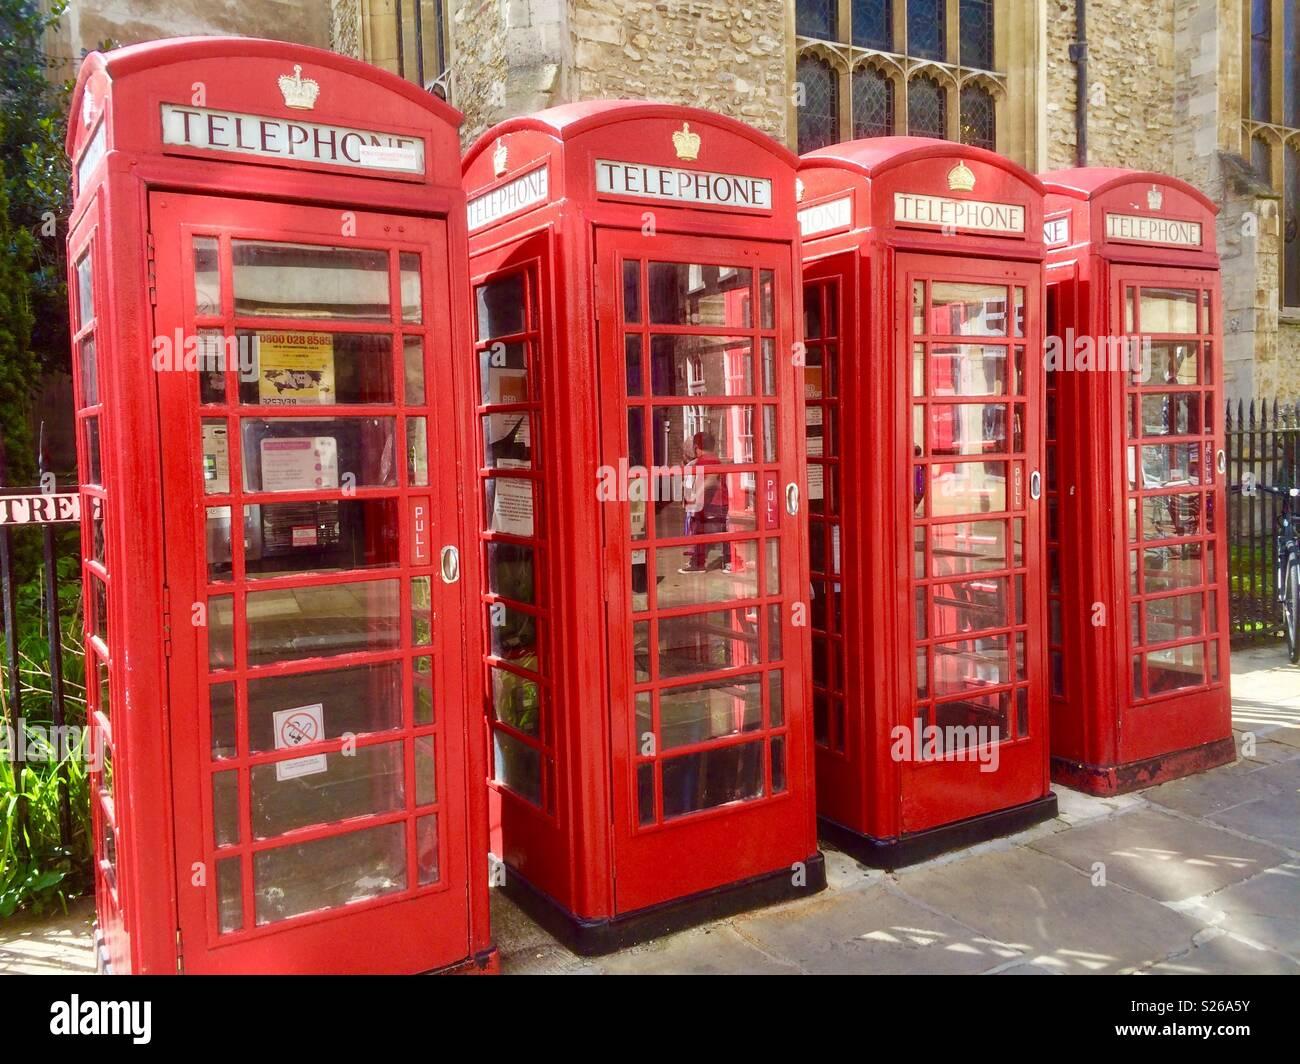 4 Telephone boxes - Stock Image